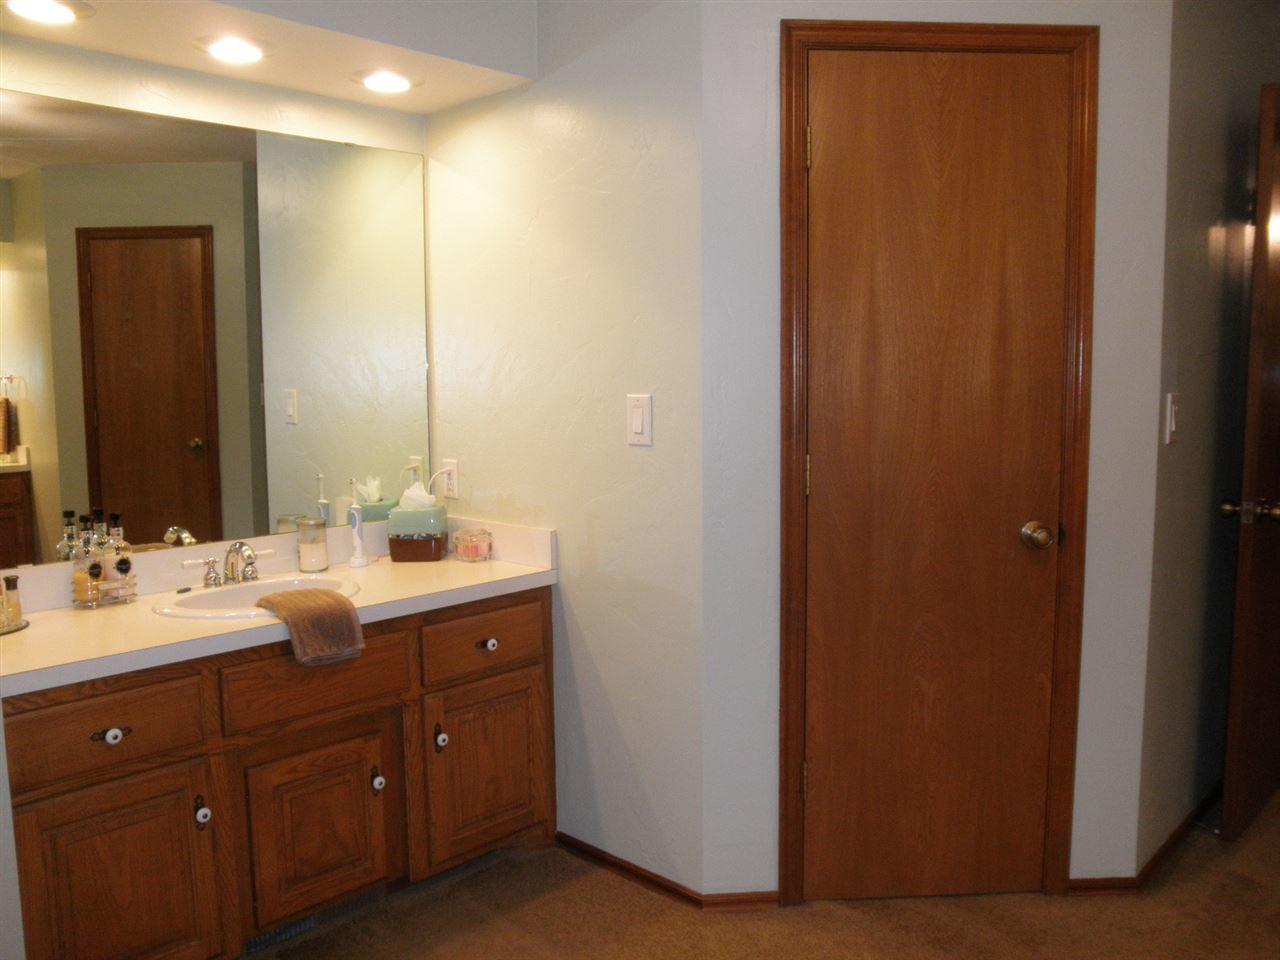 Sold Intraoffice W/MLS | 2800 Green Meadow Ponca City, OK 74604 17